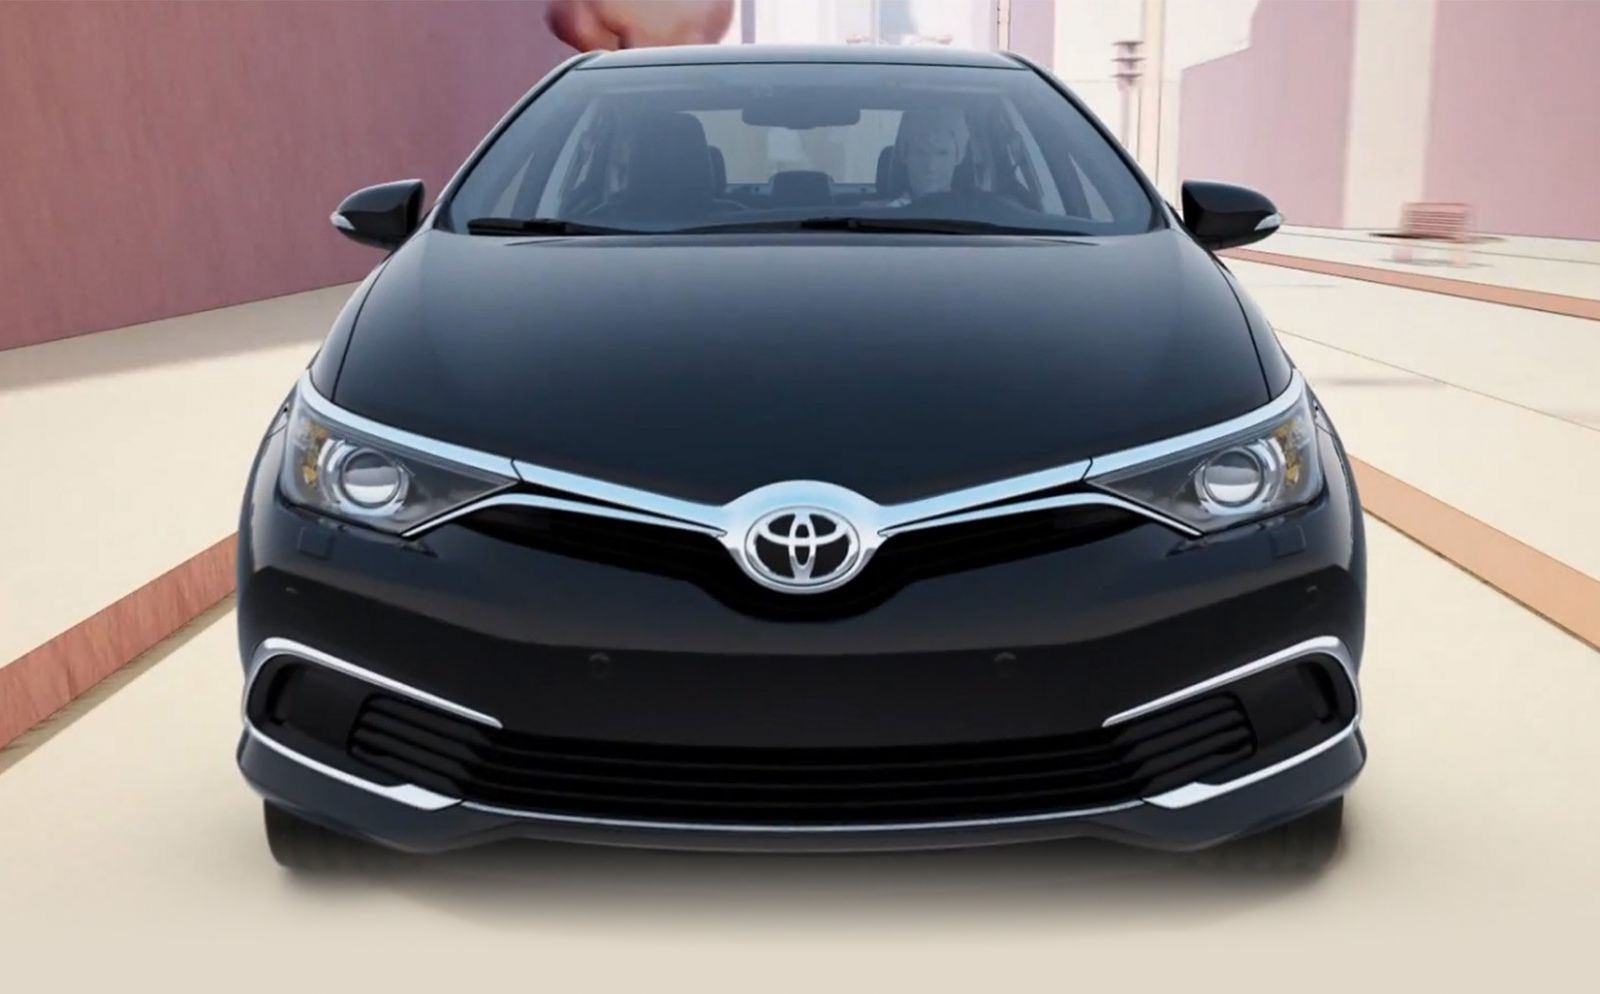 Geneva Safety Tech Video Hints At 2016 Toyota Corolla Sedan Facelift